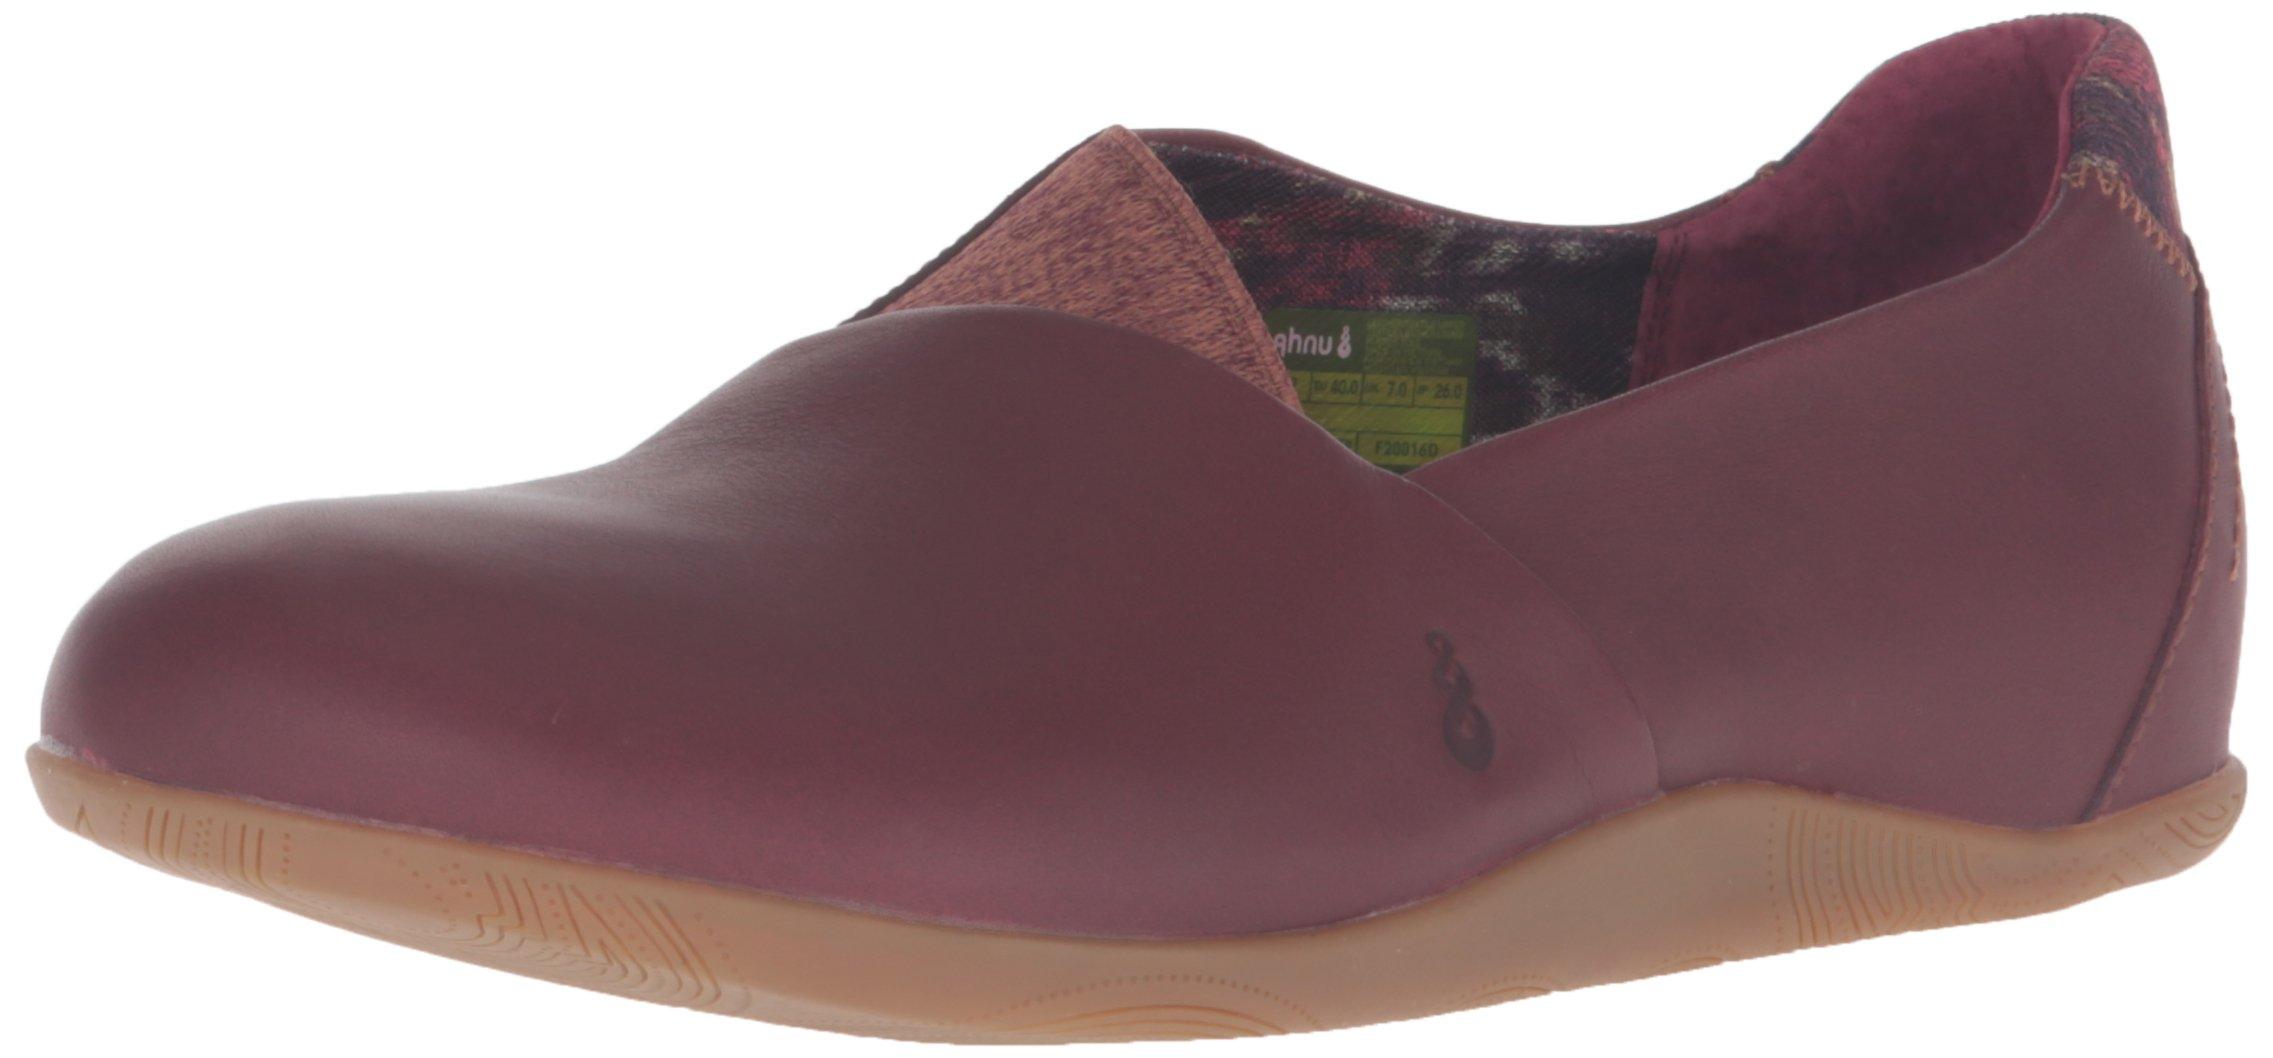 Ahnu Women's Tola Slip-On Casual Shoe, Merlot, 8.5 M US